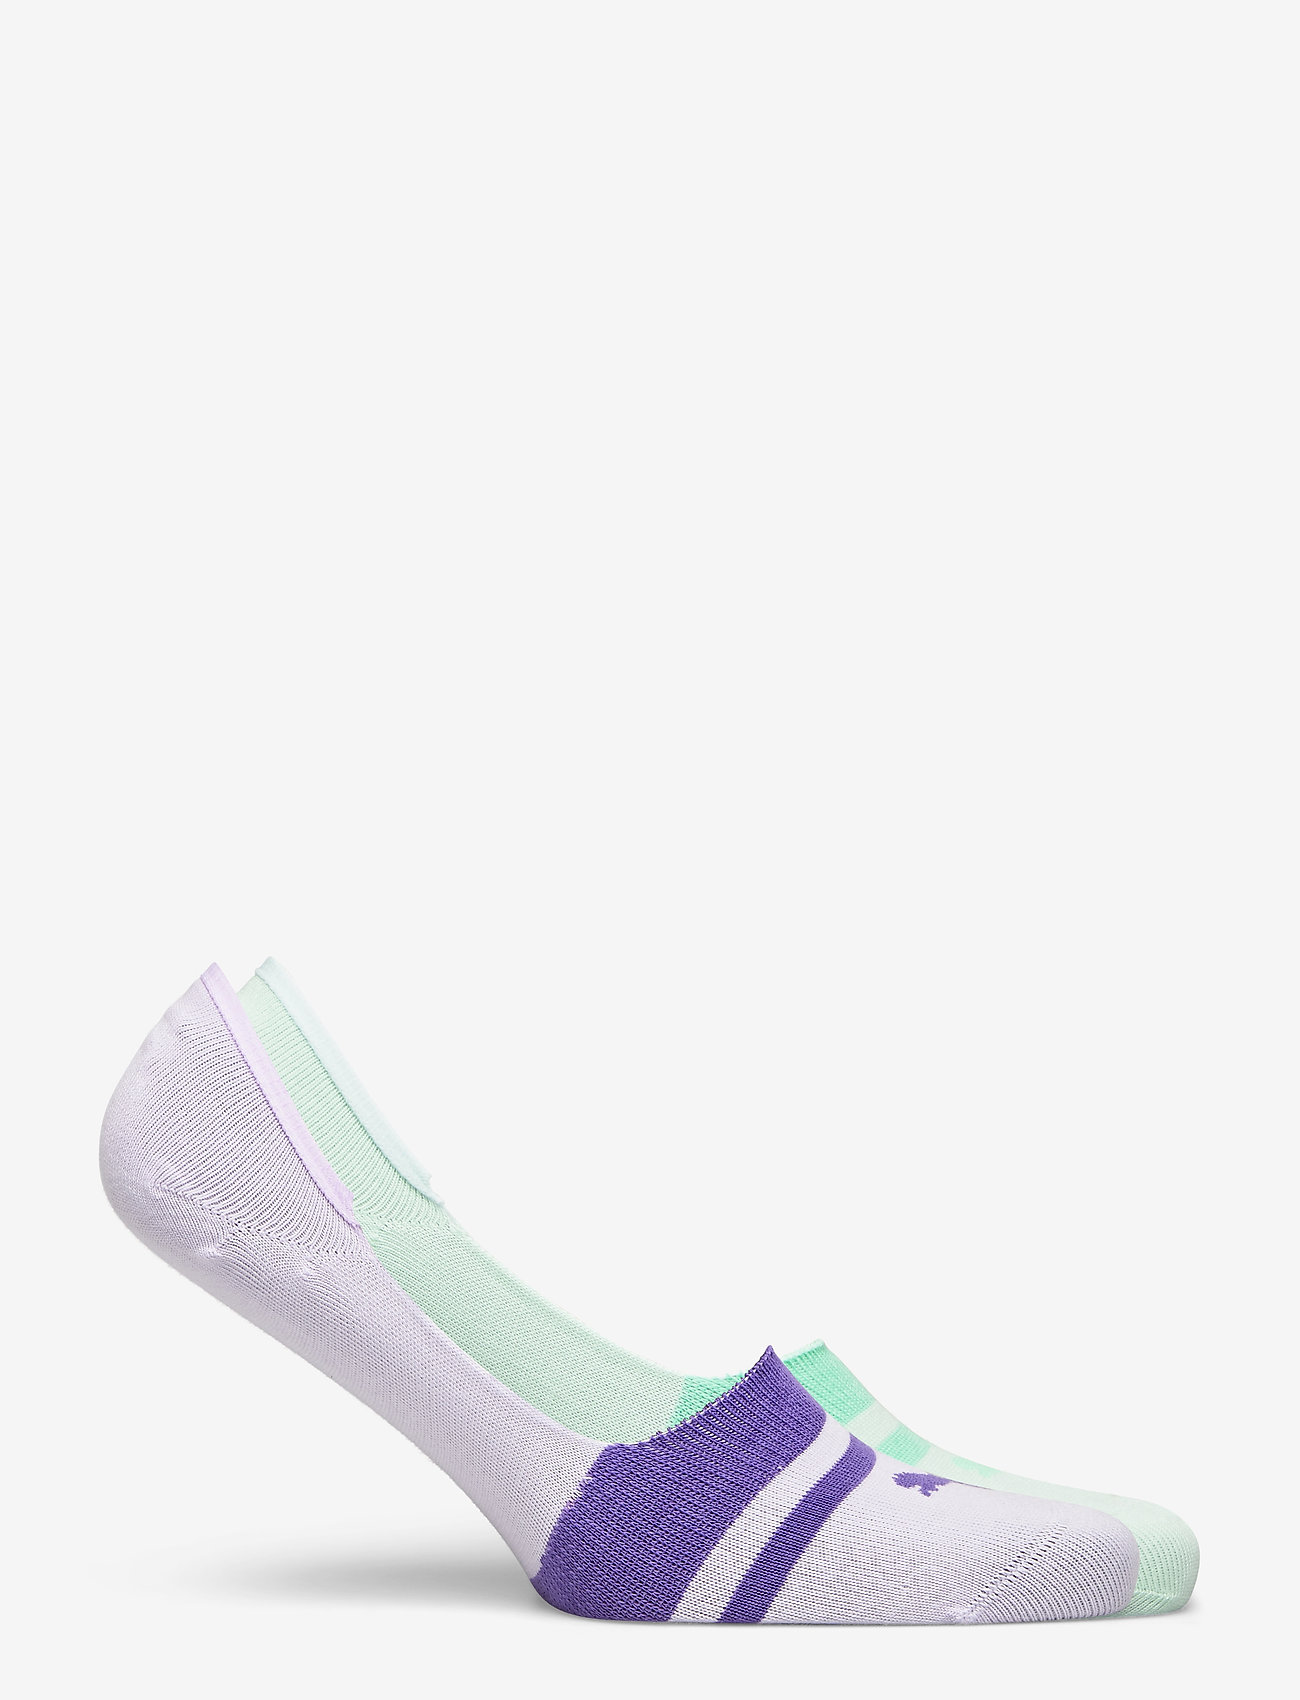 PUMA - PUMA HERITAGE FOOTIE 2P UNISEX - kousen - mixed colors - 1